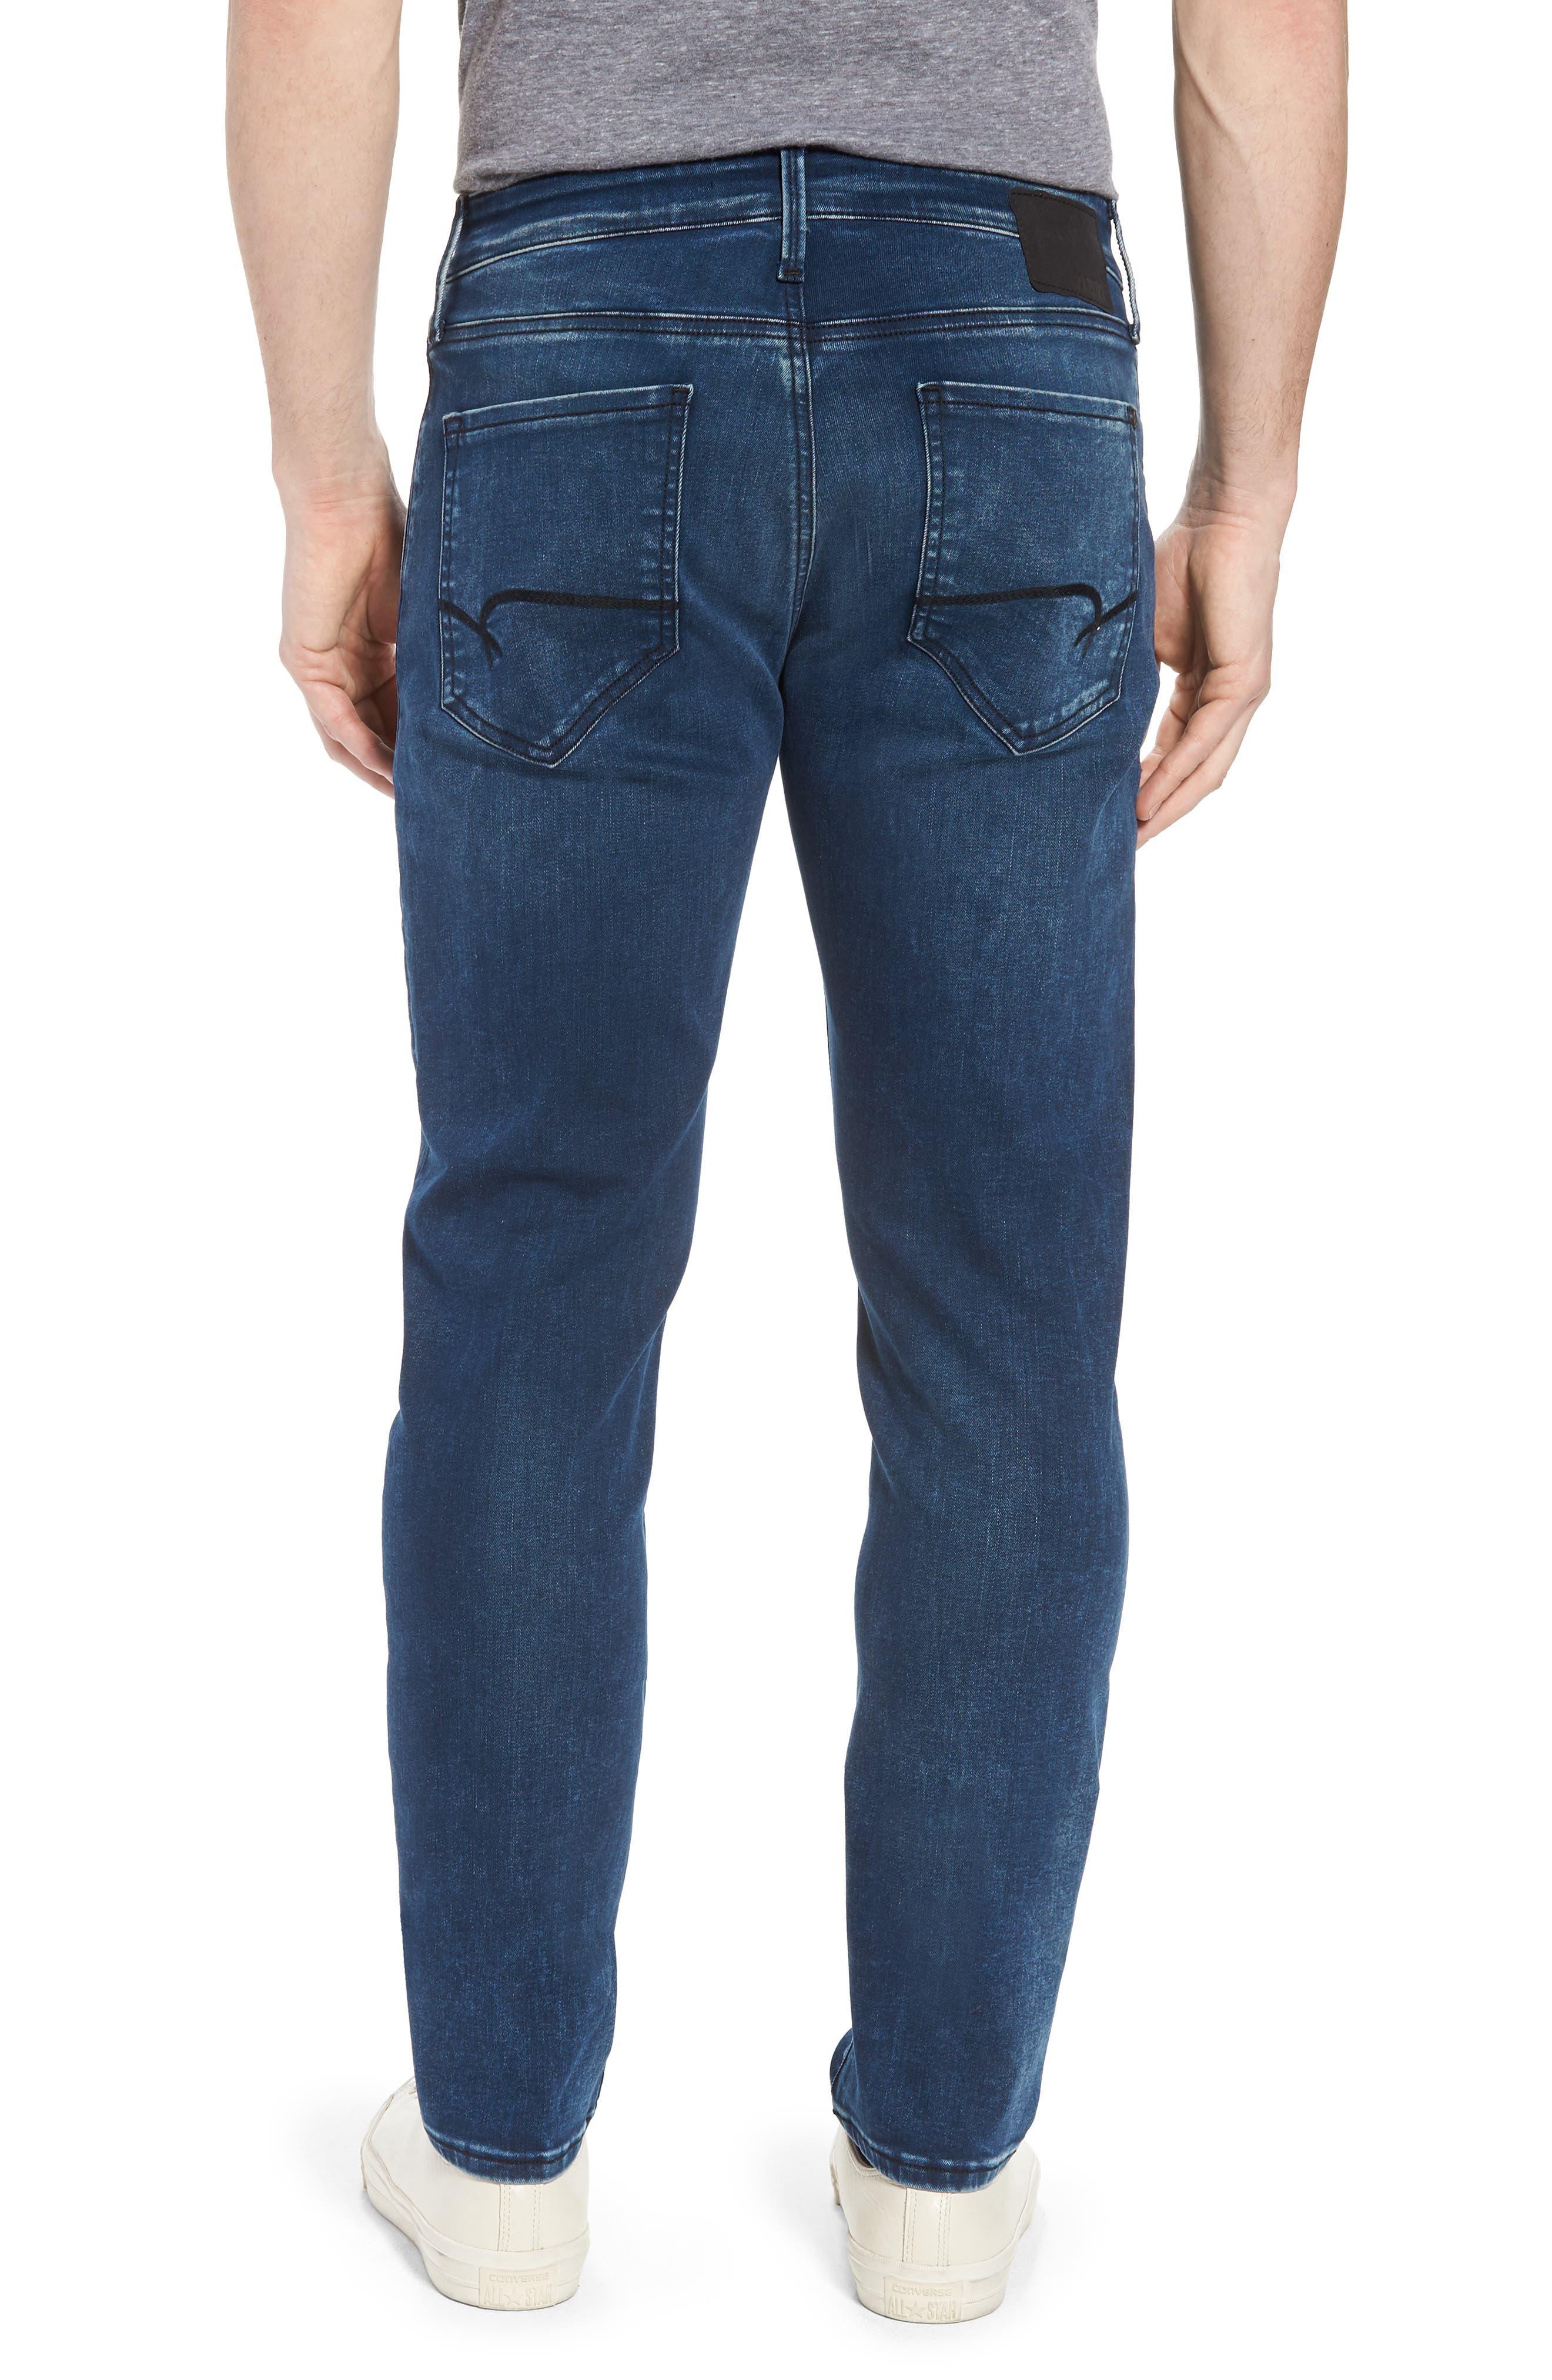 Marcus Slim Straight Leg Jeans,                             Alternate thumbnail 2, color,                             Forest Blue Williamsburg